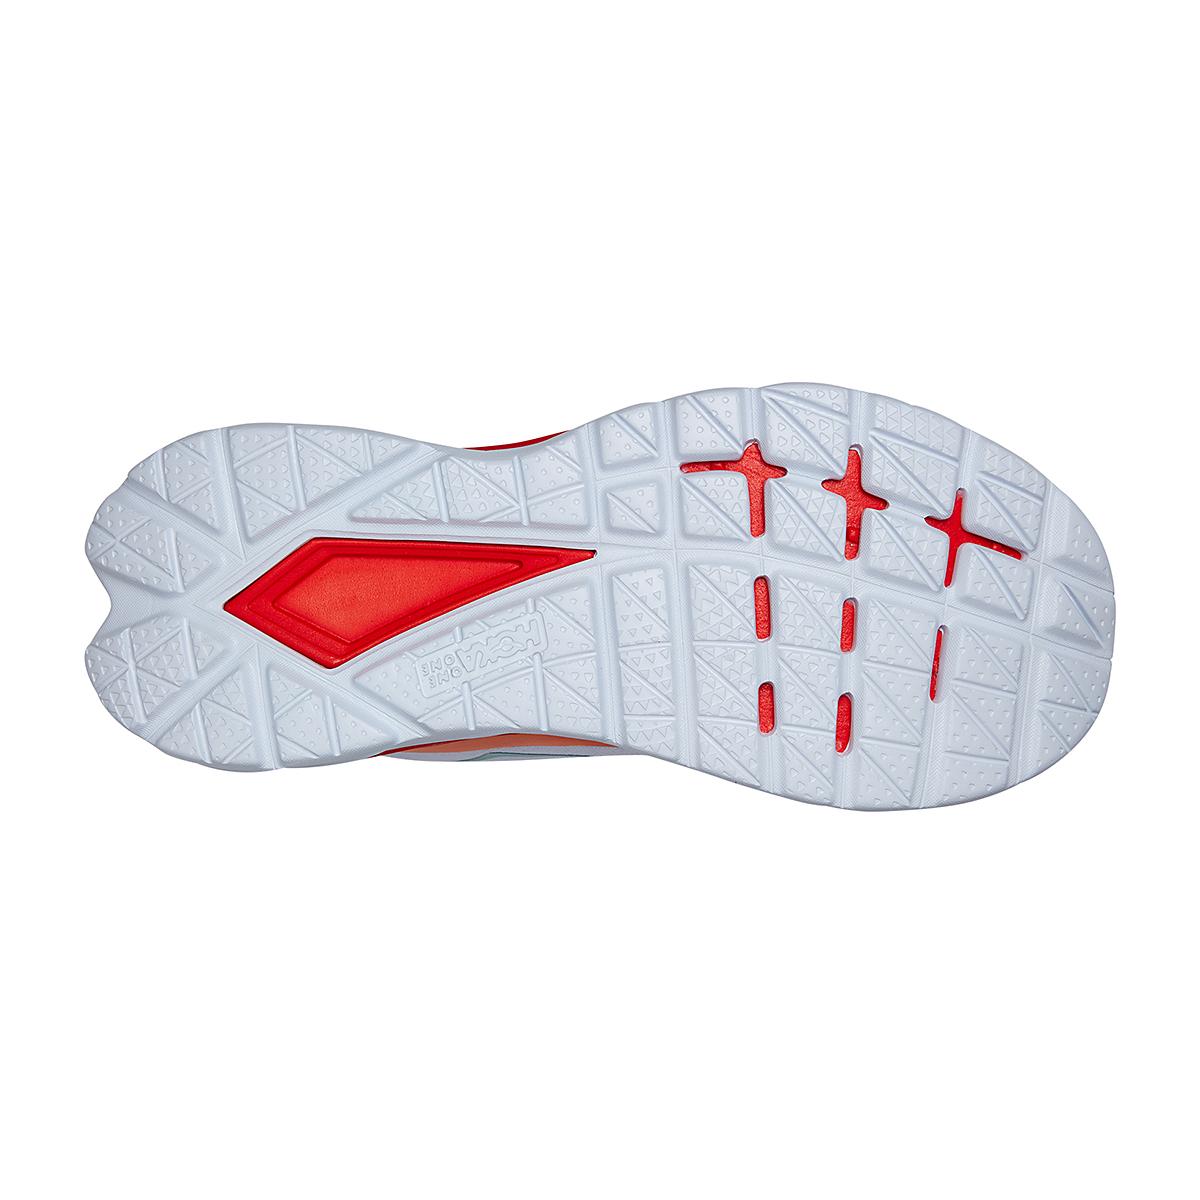 Women's Hoka One One Mach 4 Running Shoe - Color: White/Fiesta - Size: 5 - Width: Regular, White/Fiesta, large, image 6